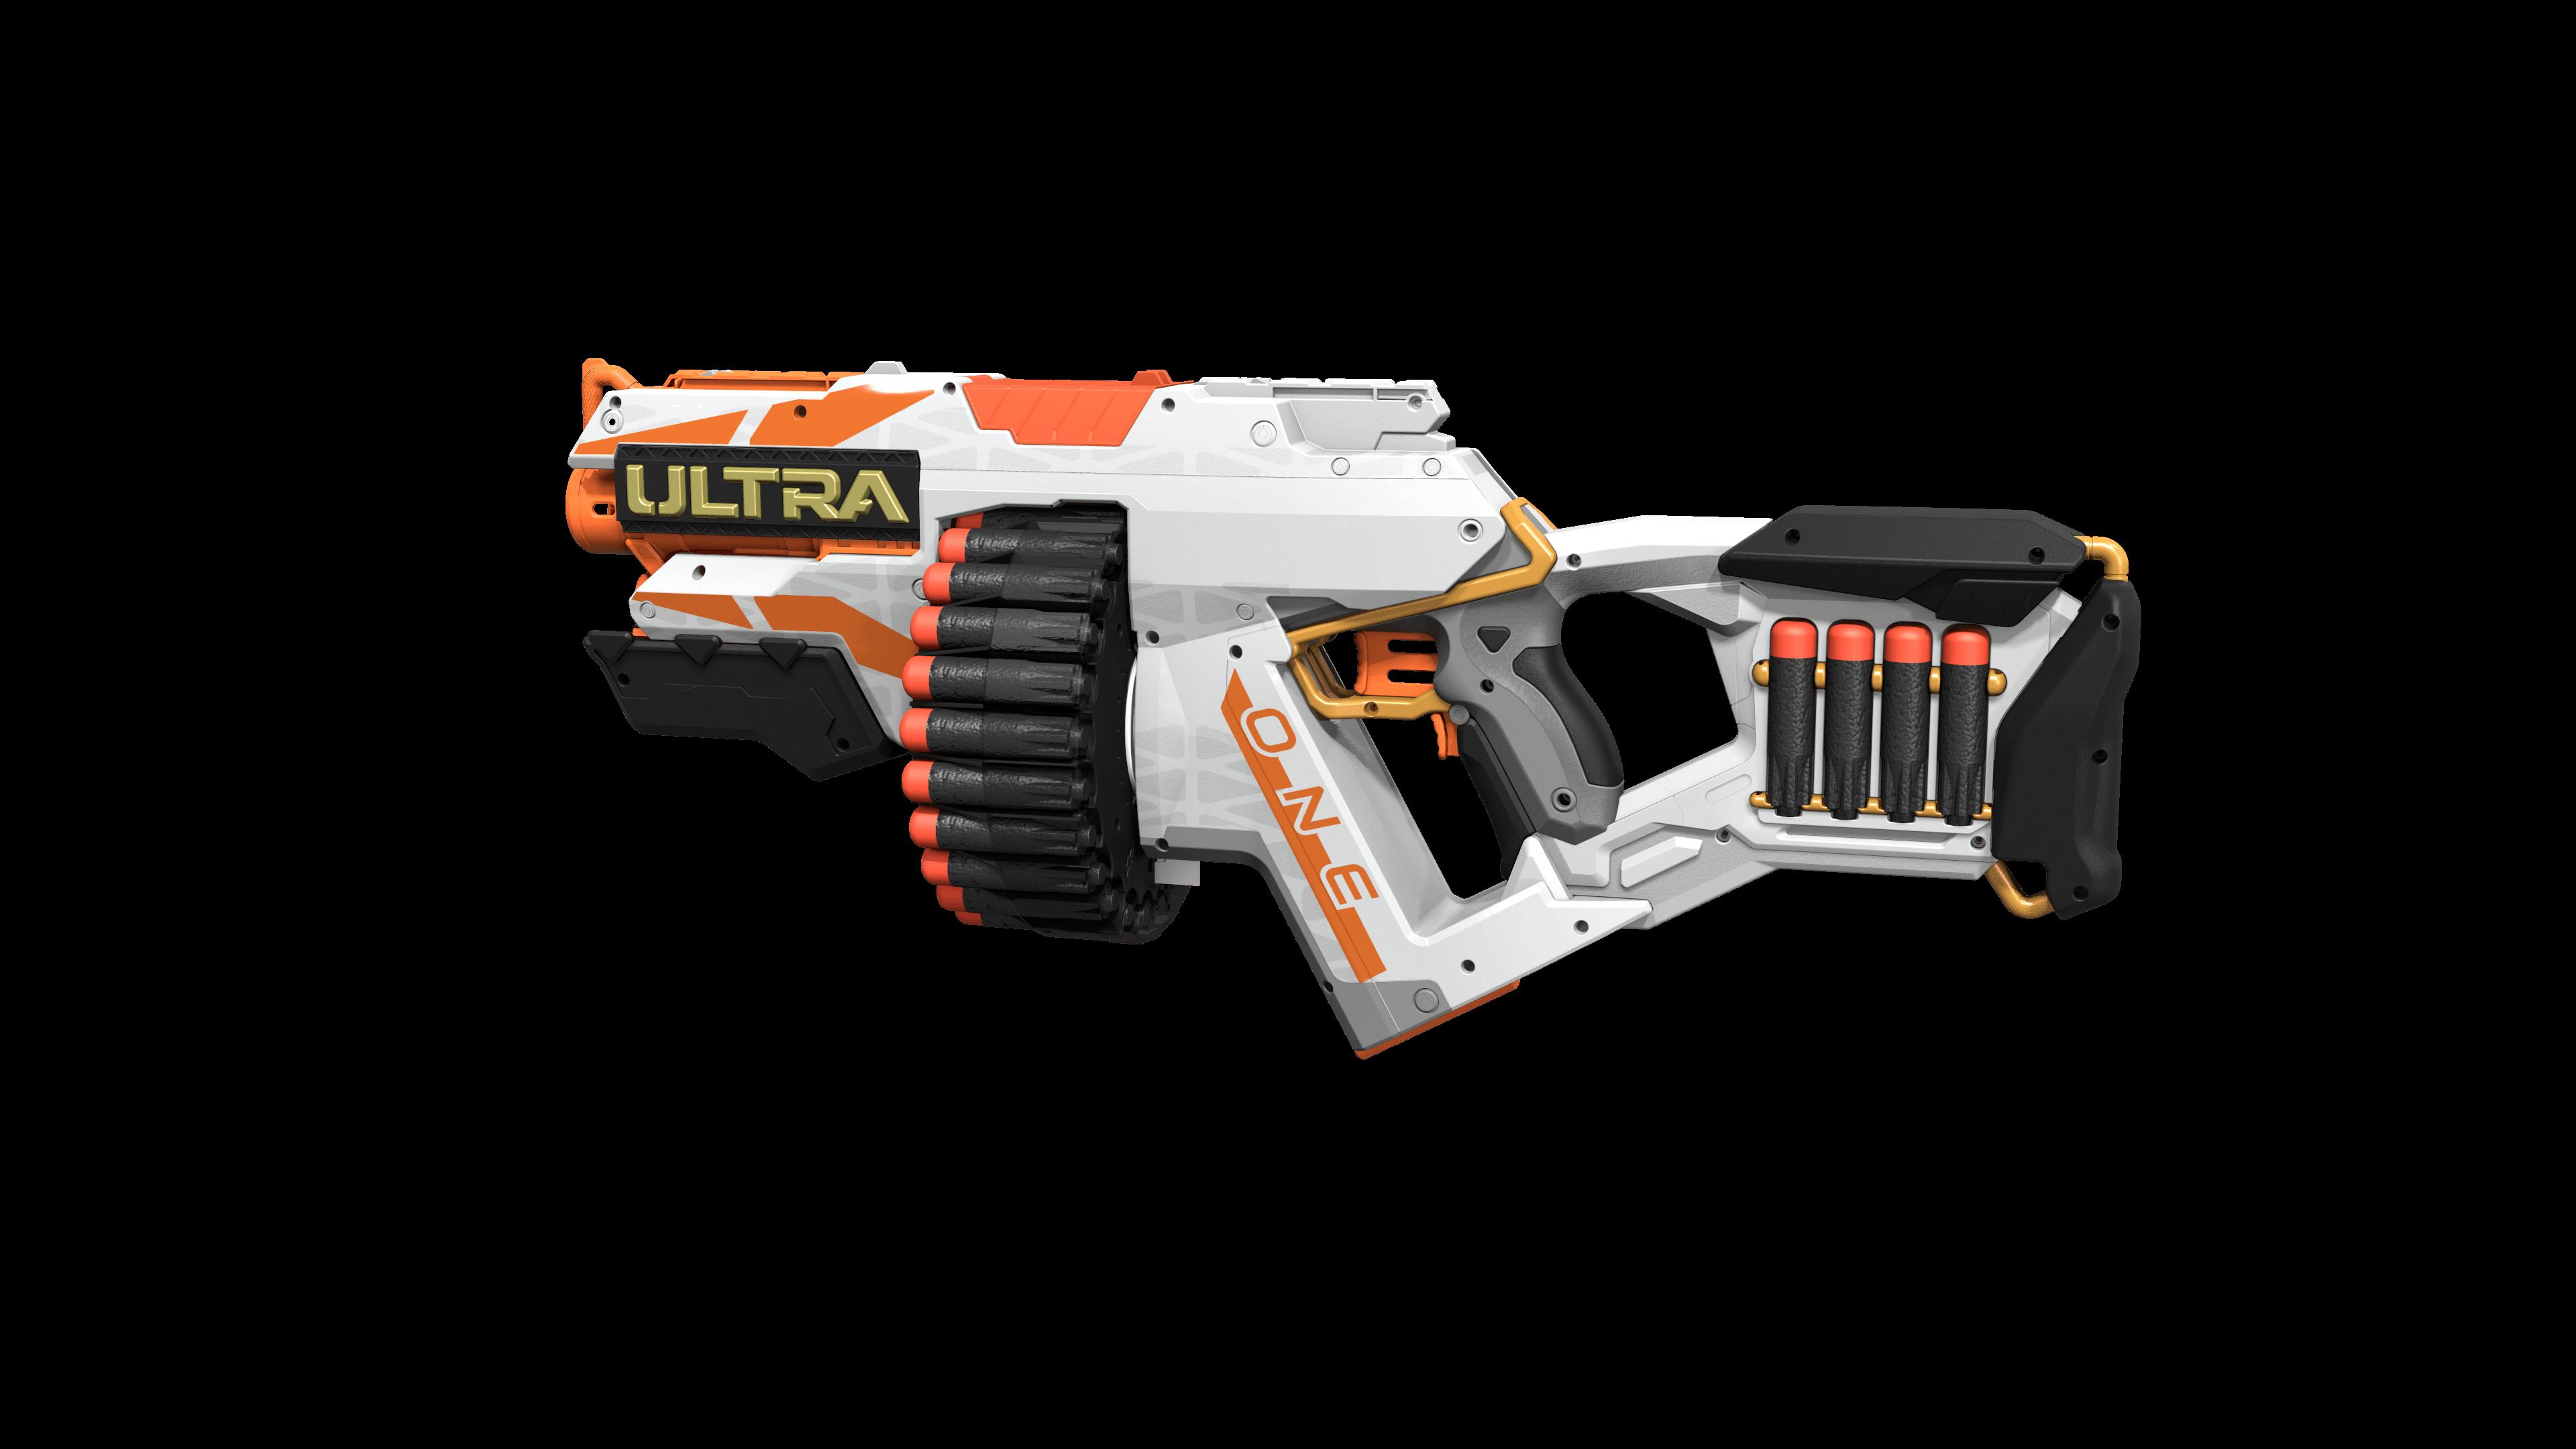 ultra blaster img 57